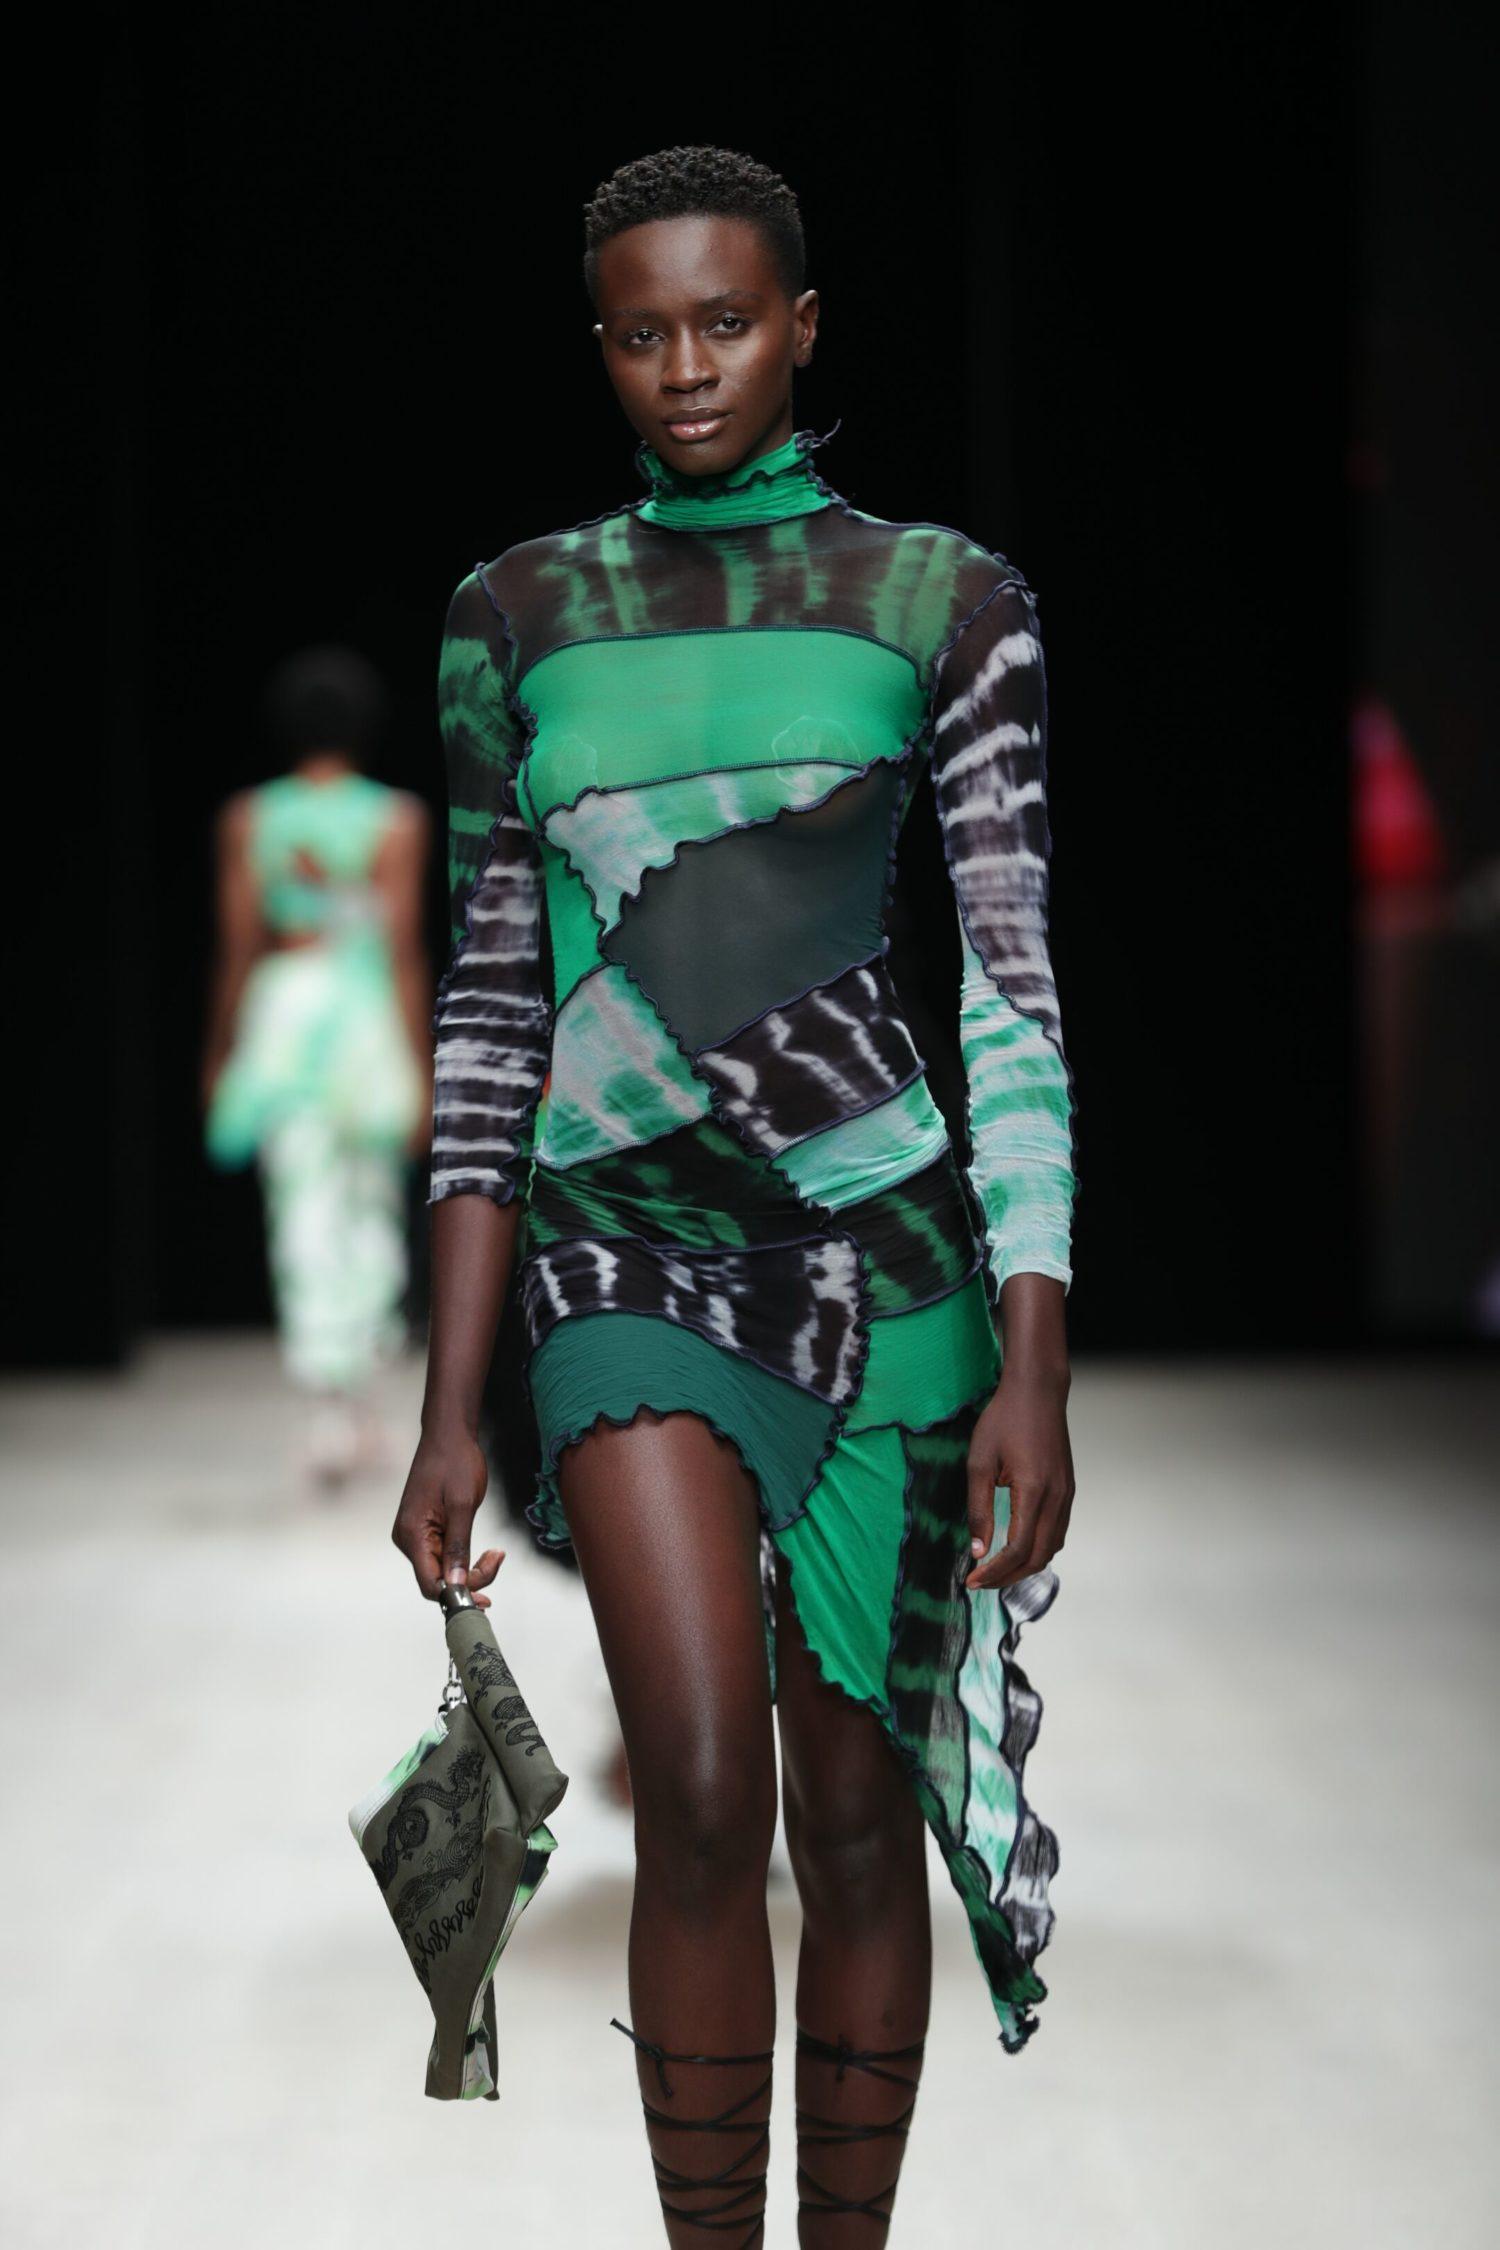 ARISE Fashion Week 2019 | ASAI